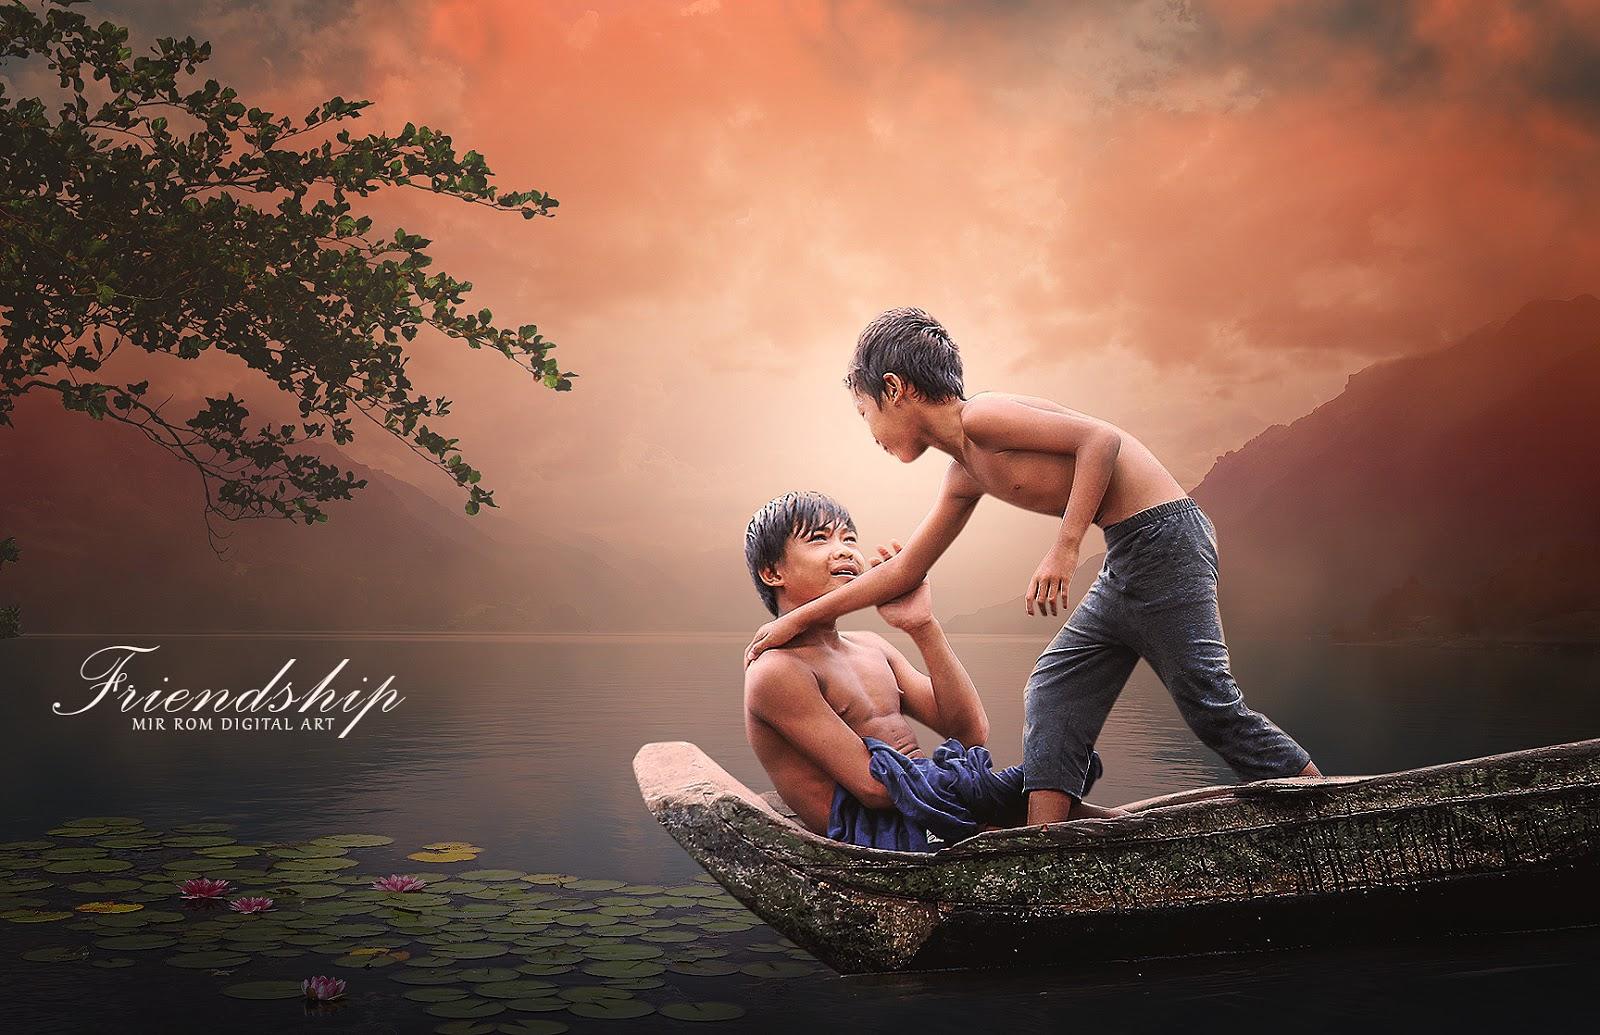 Create a Friendship Beautiful Photo Manipulation In Photoshop CC